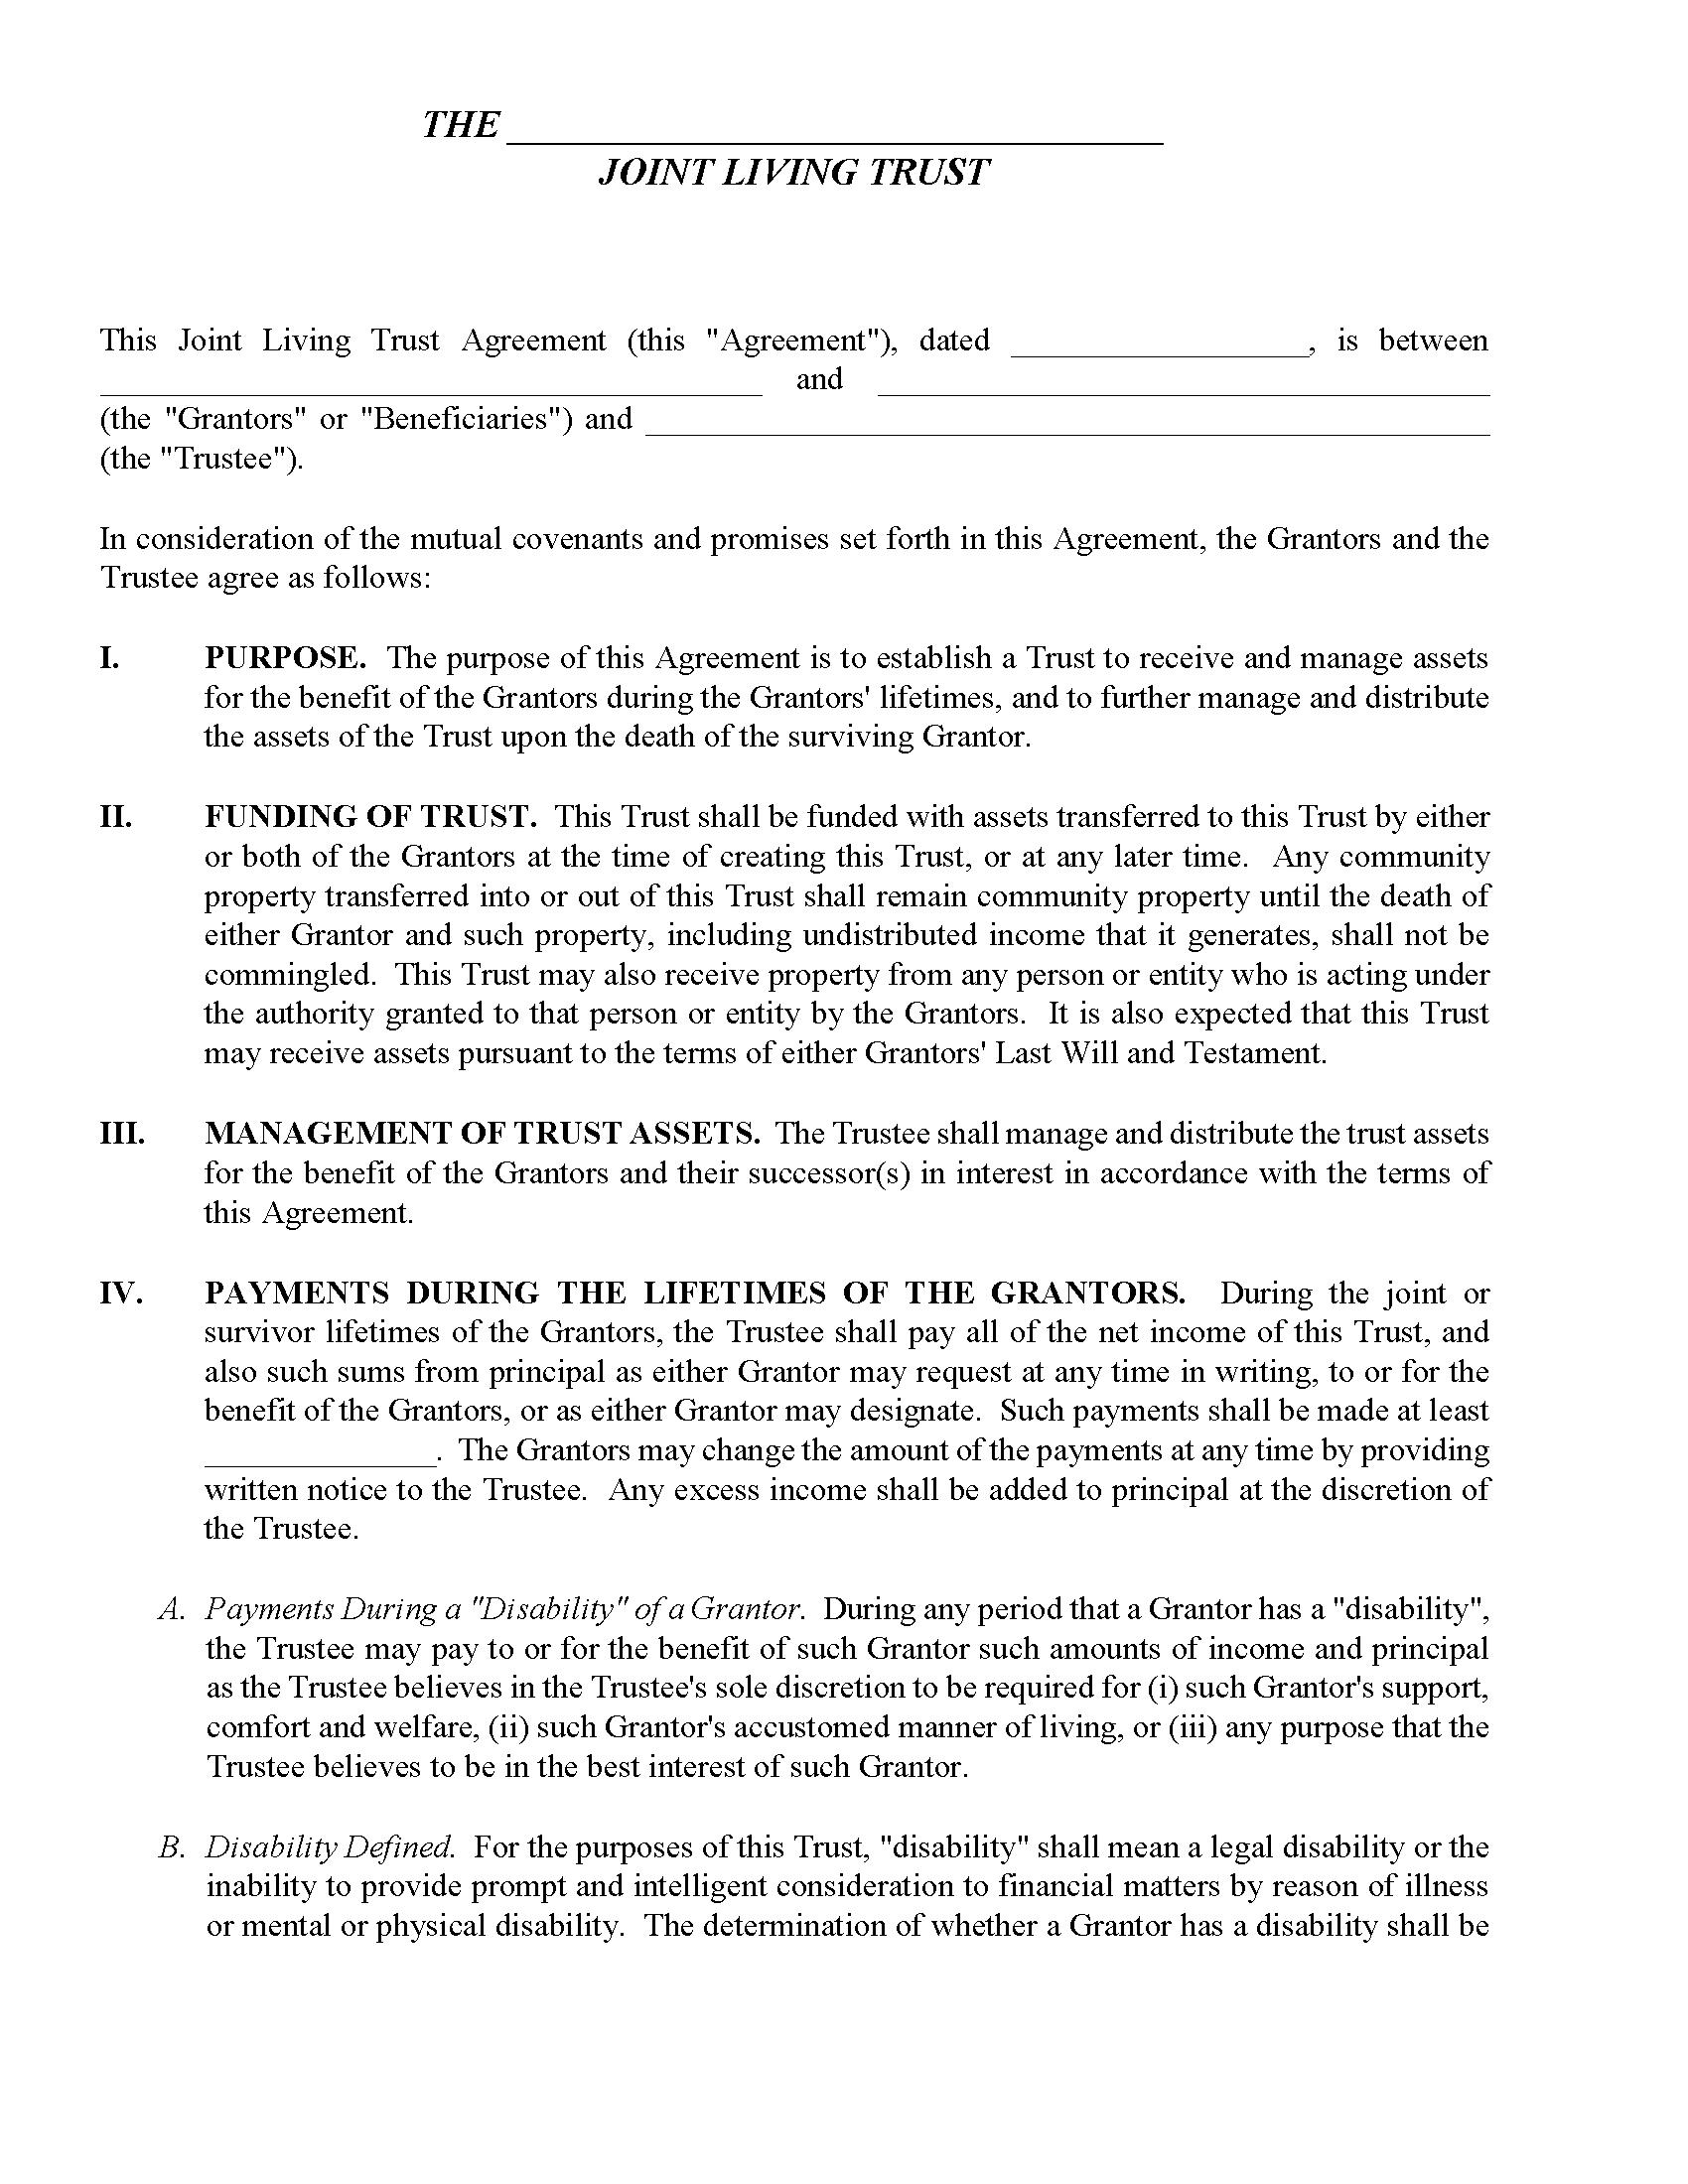 Iowa Joint Living Trust Form